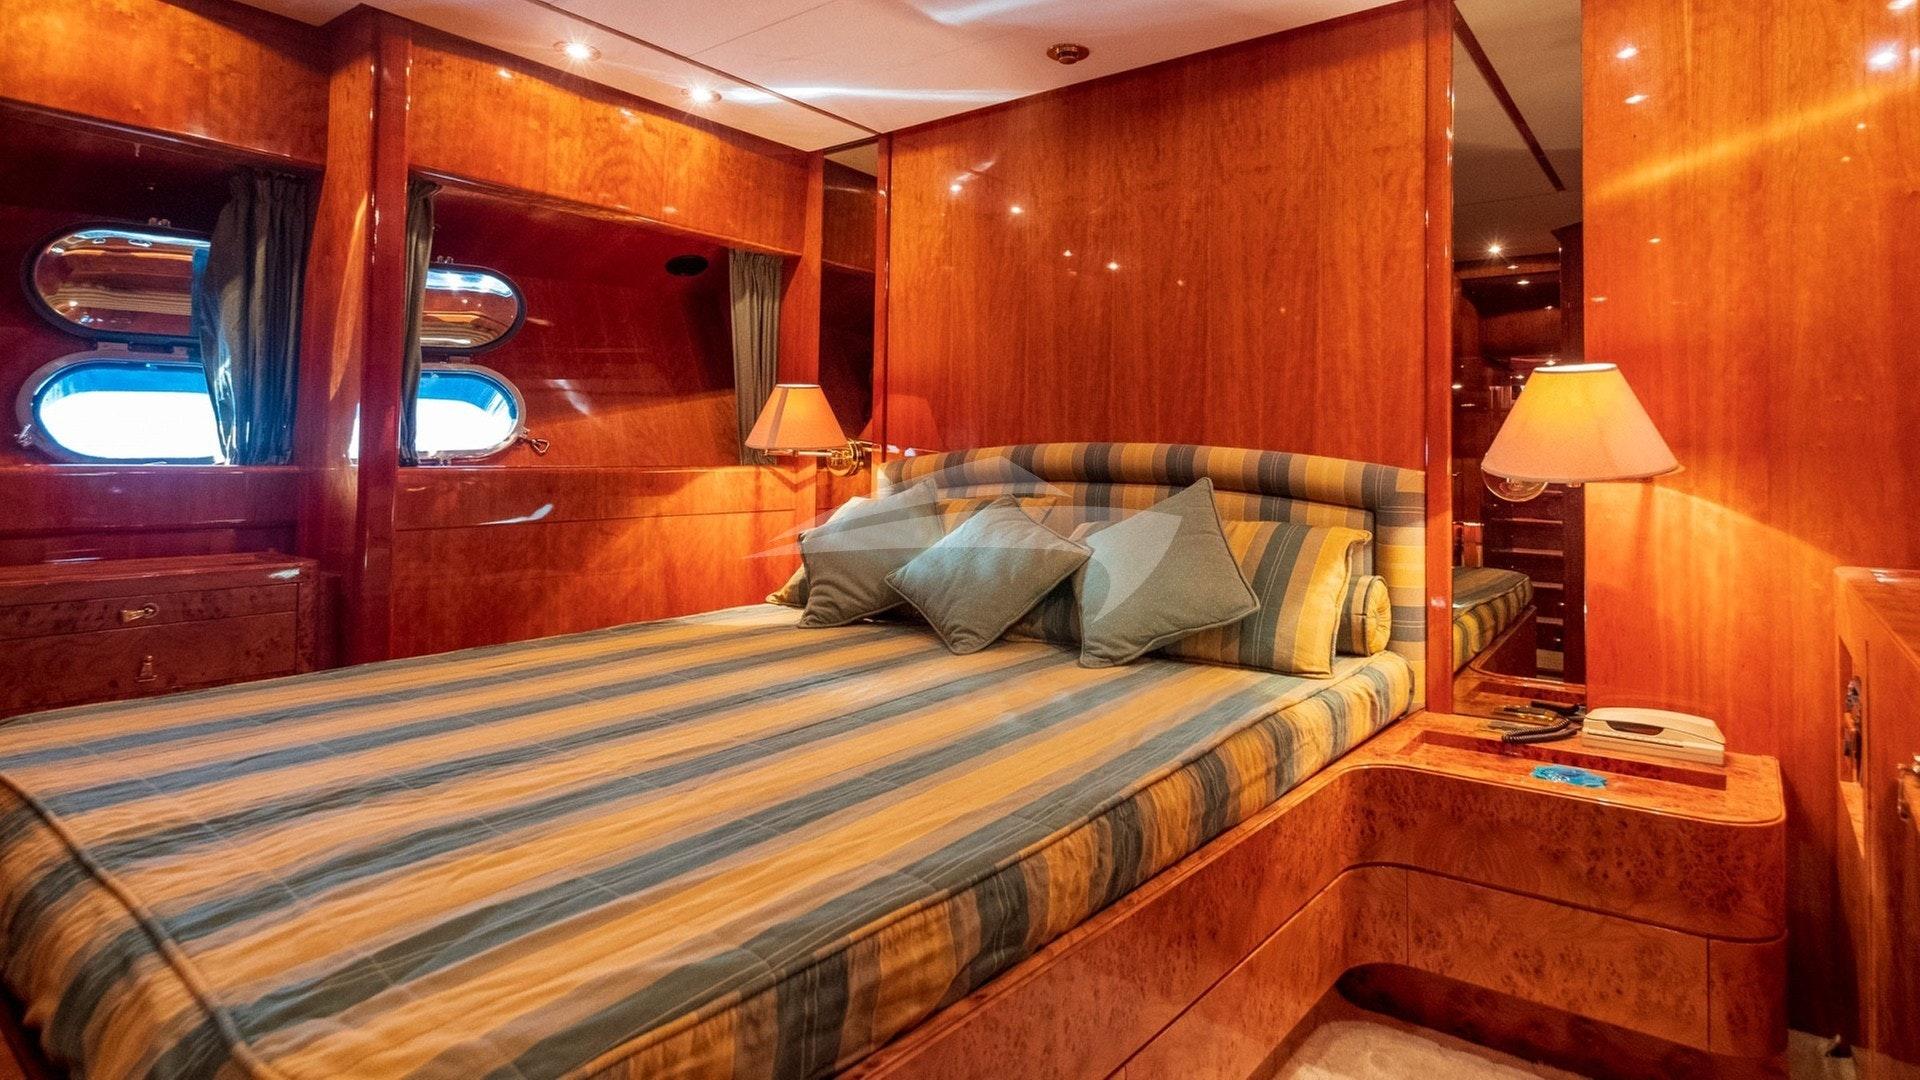 BarbarossaMoratti-SanLorenzo-72-VIP Cabin-01